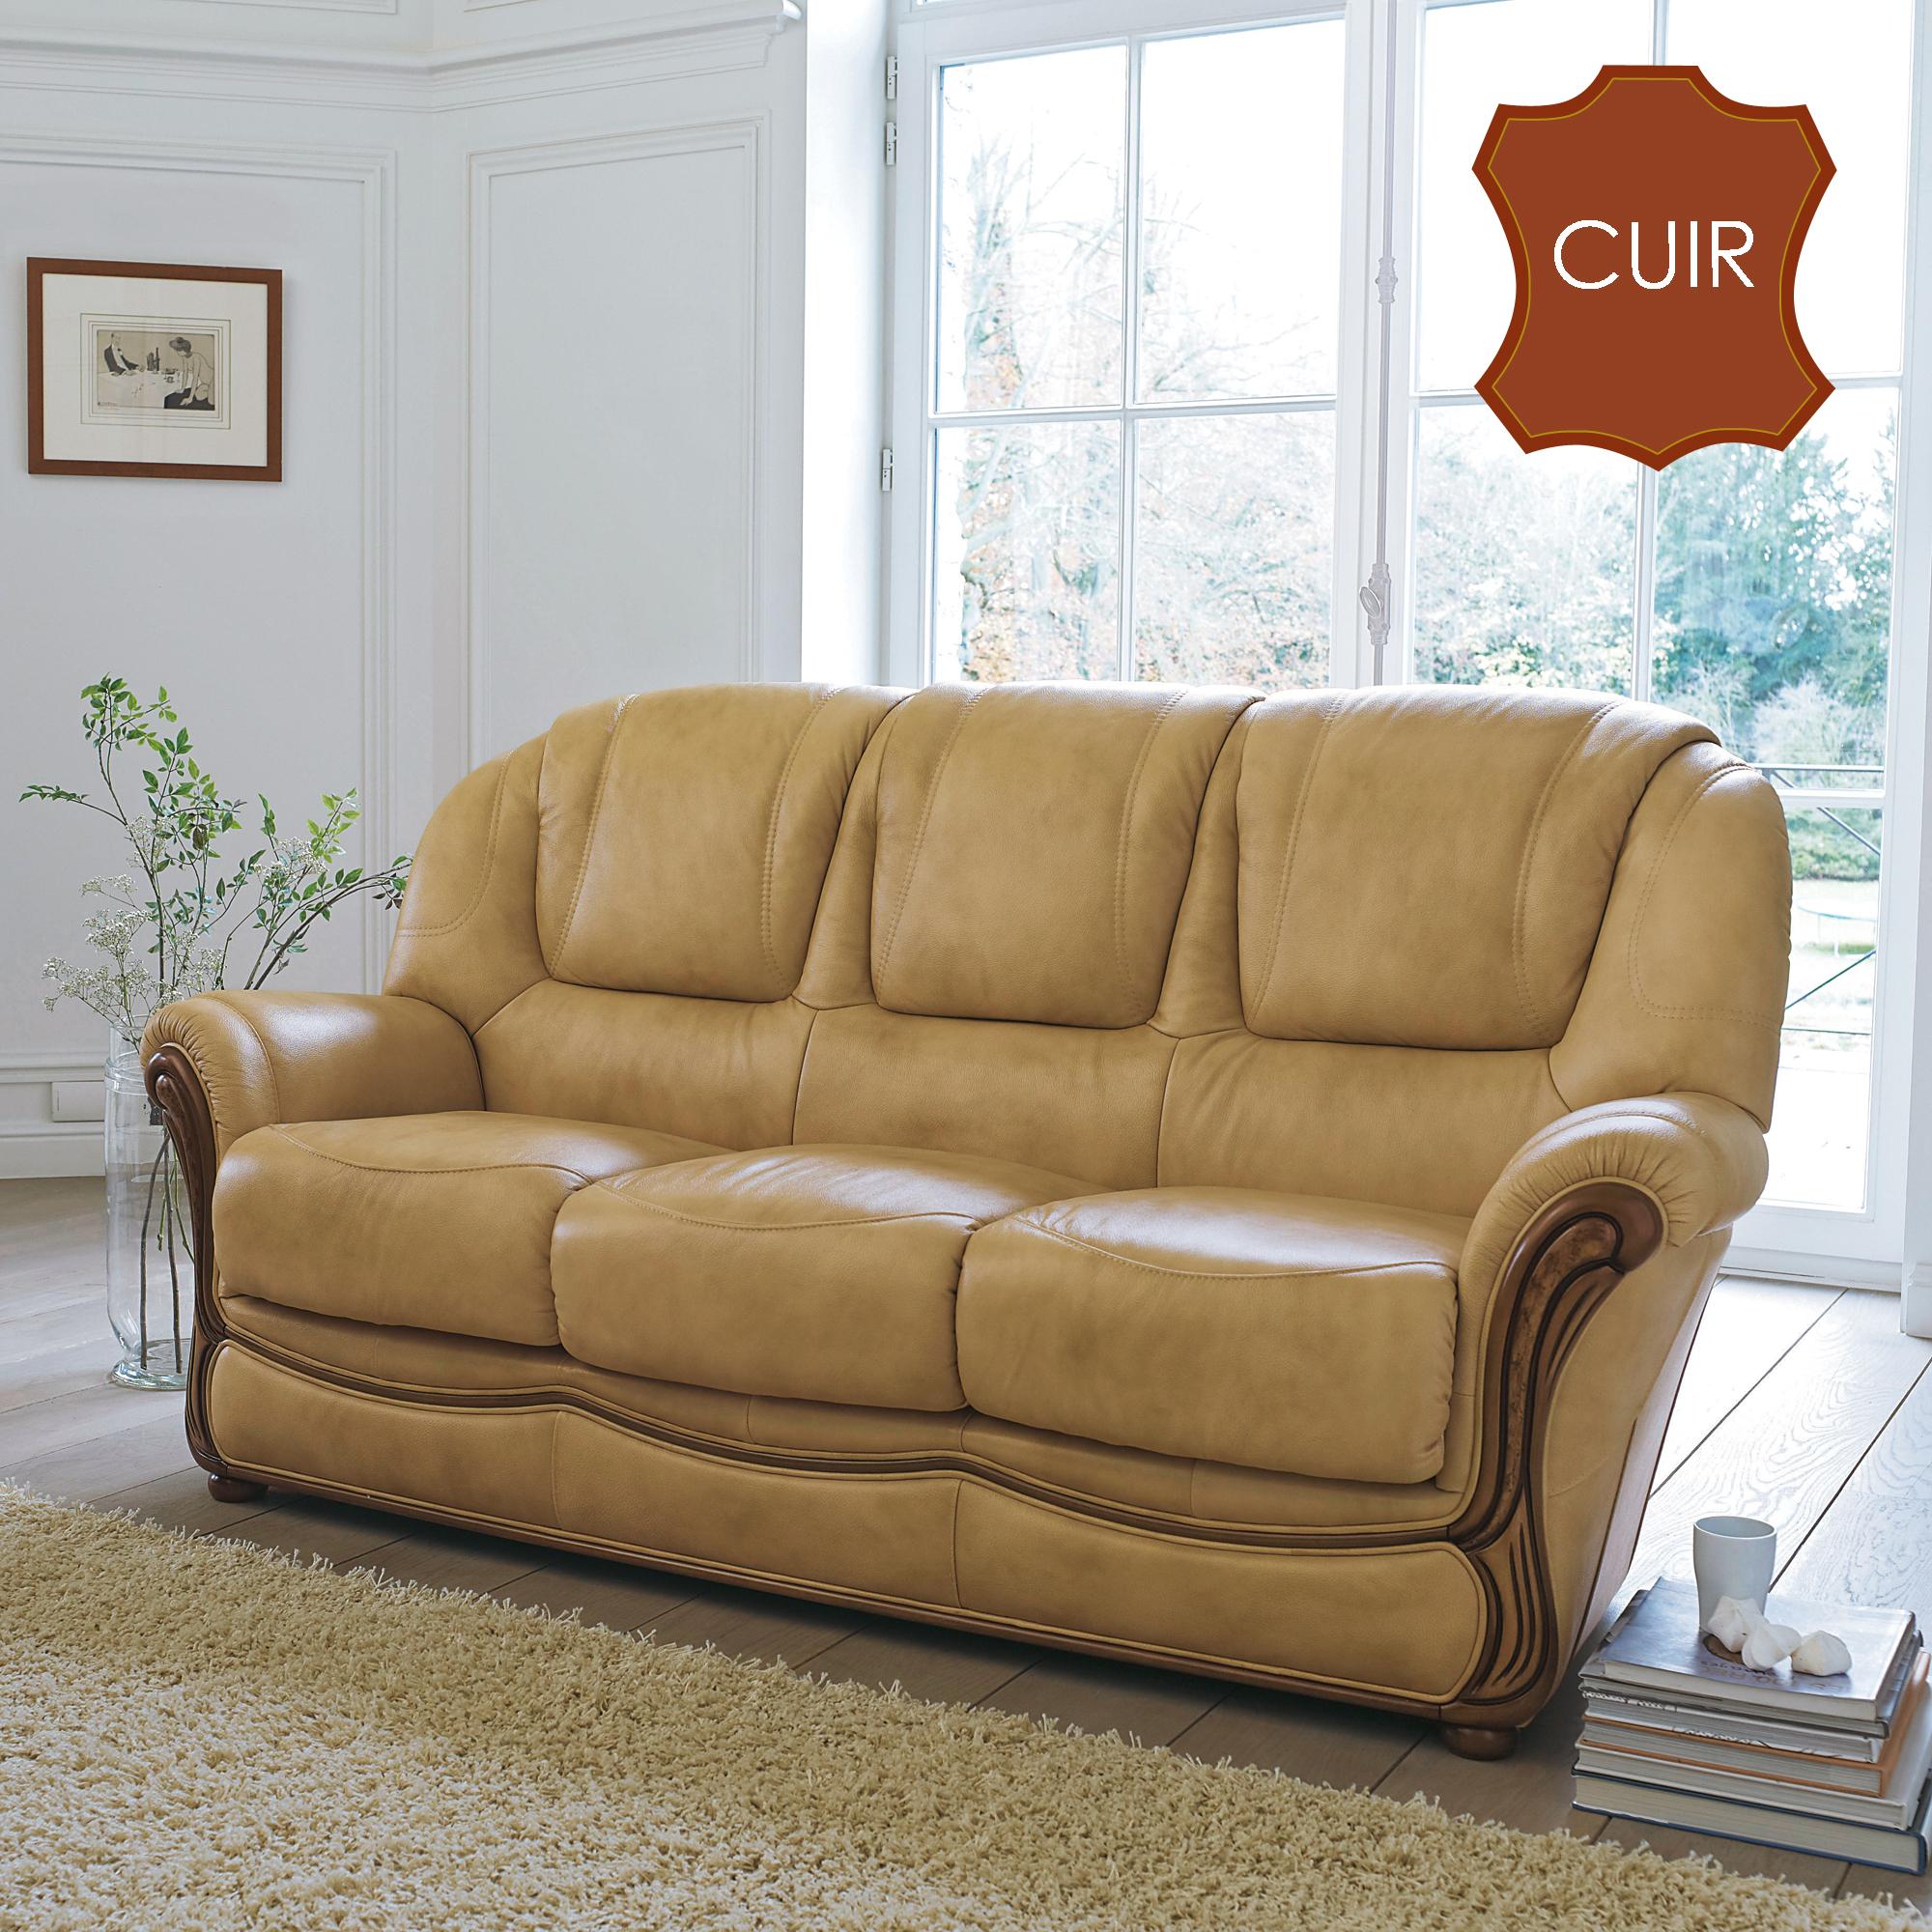 canap cuir center univers canap. Black Bedroom Furniture Sets. Home Design Ideas